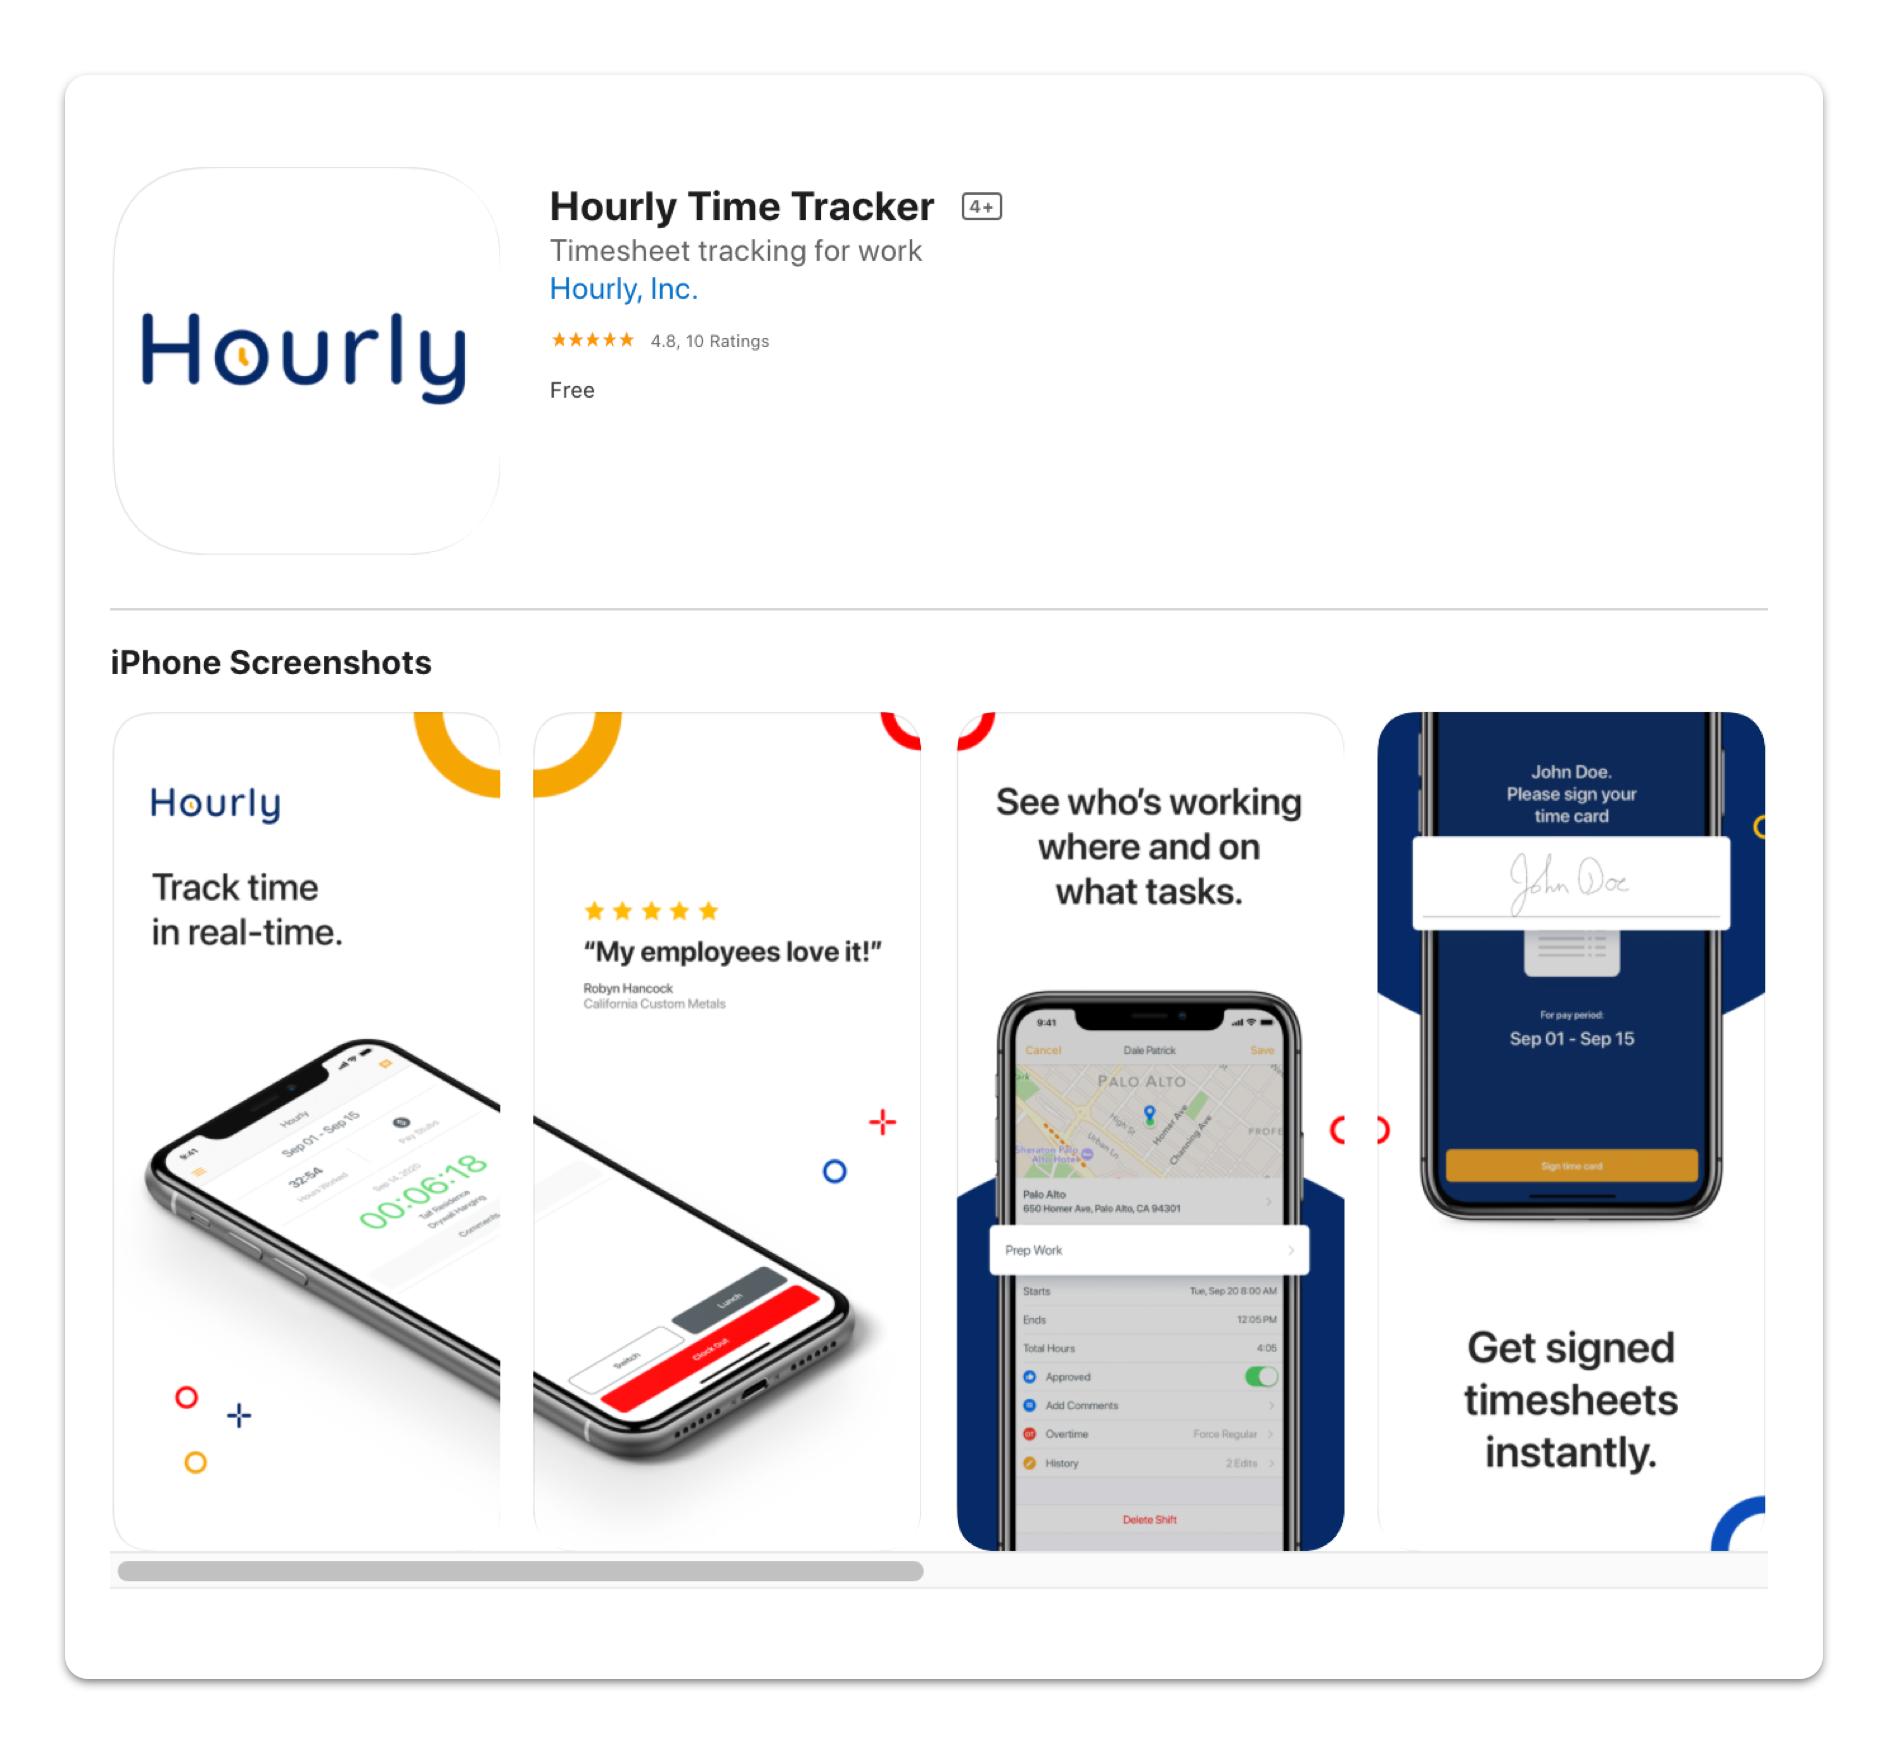 Hourly mobile app screenshots